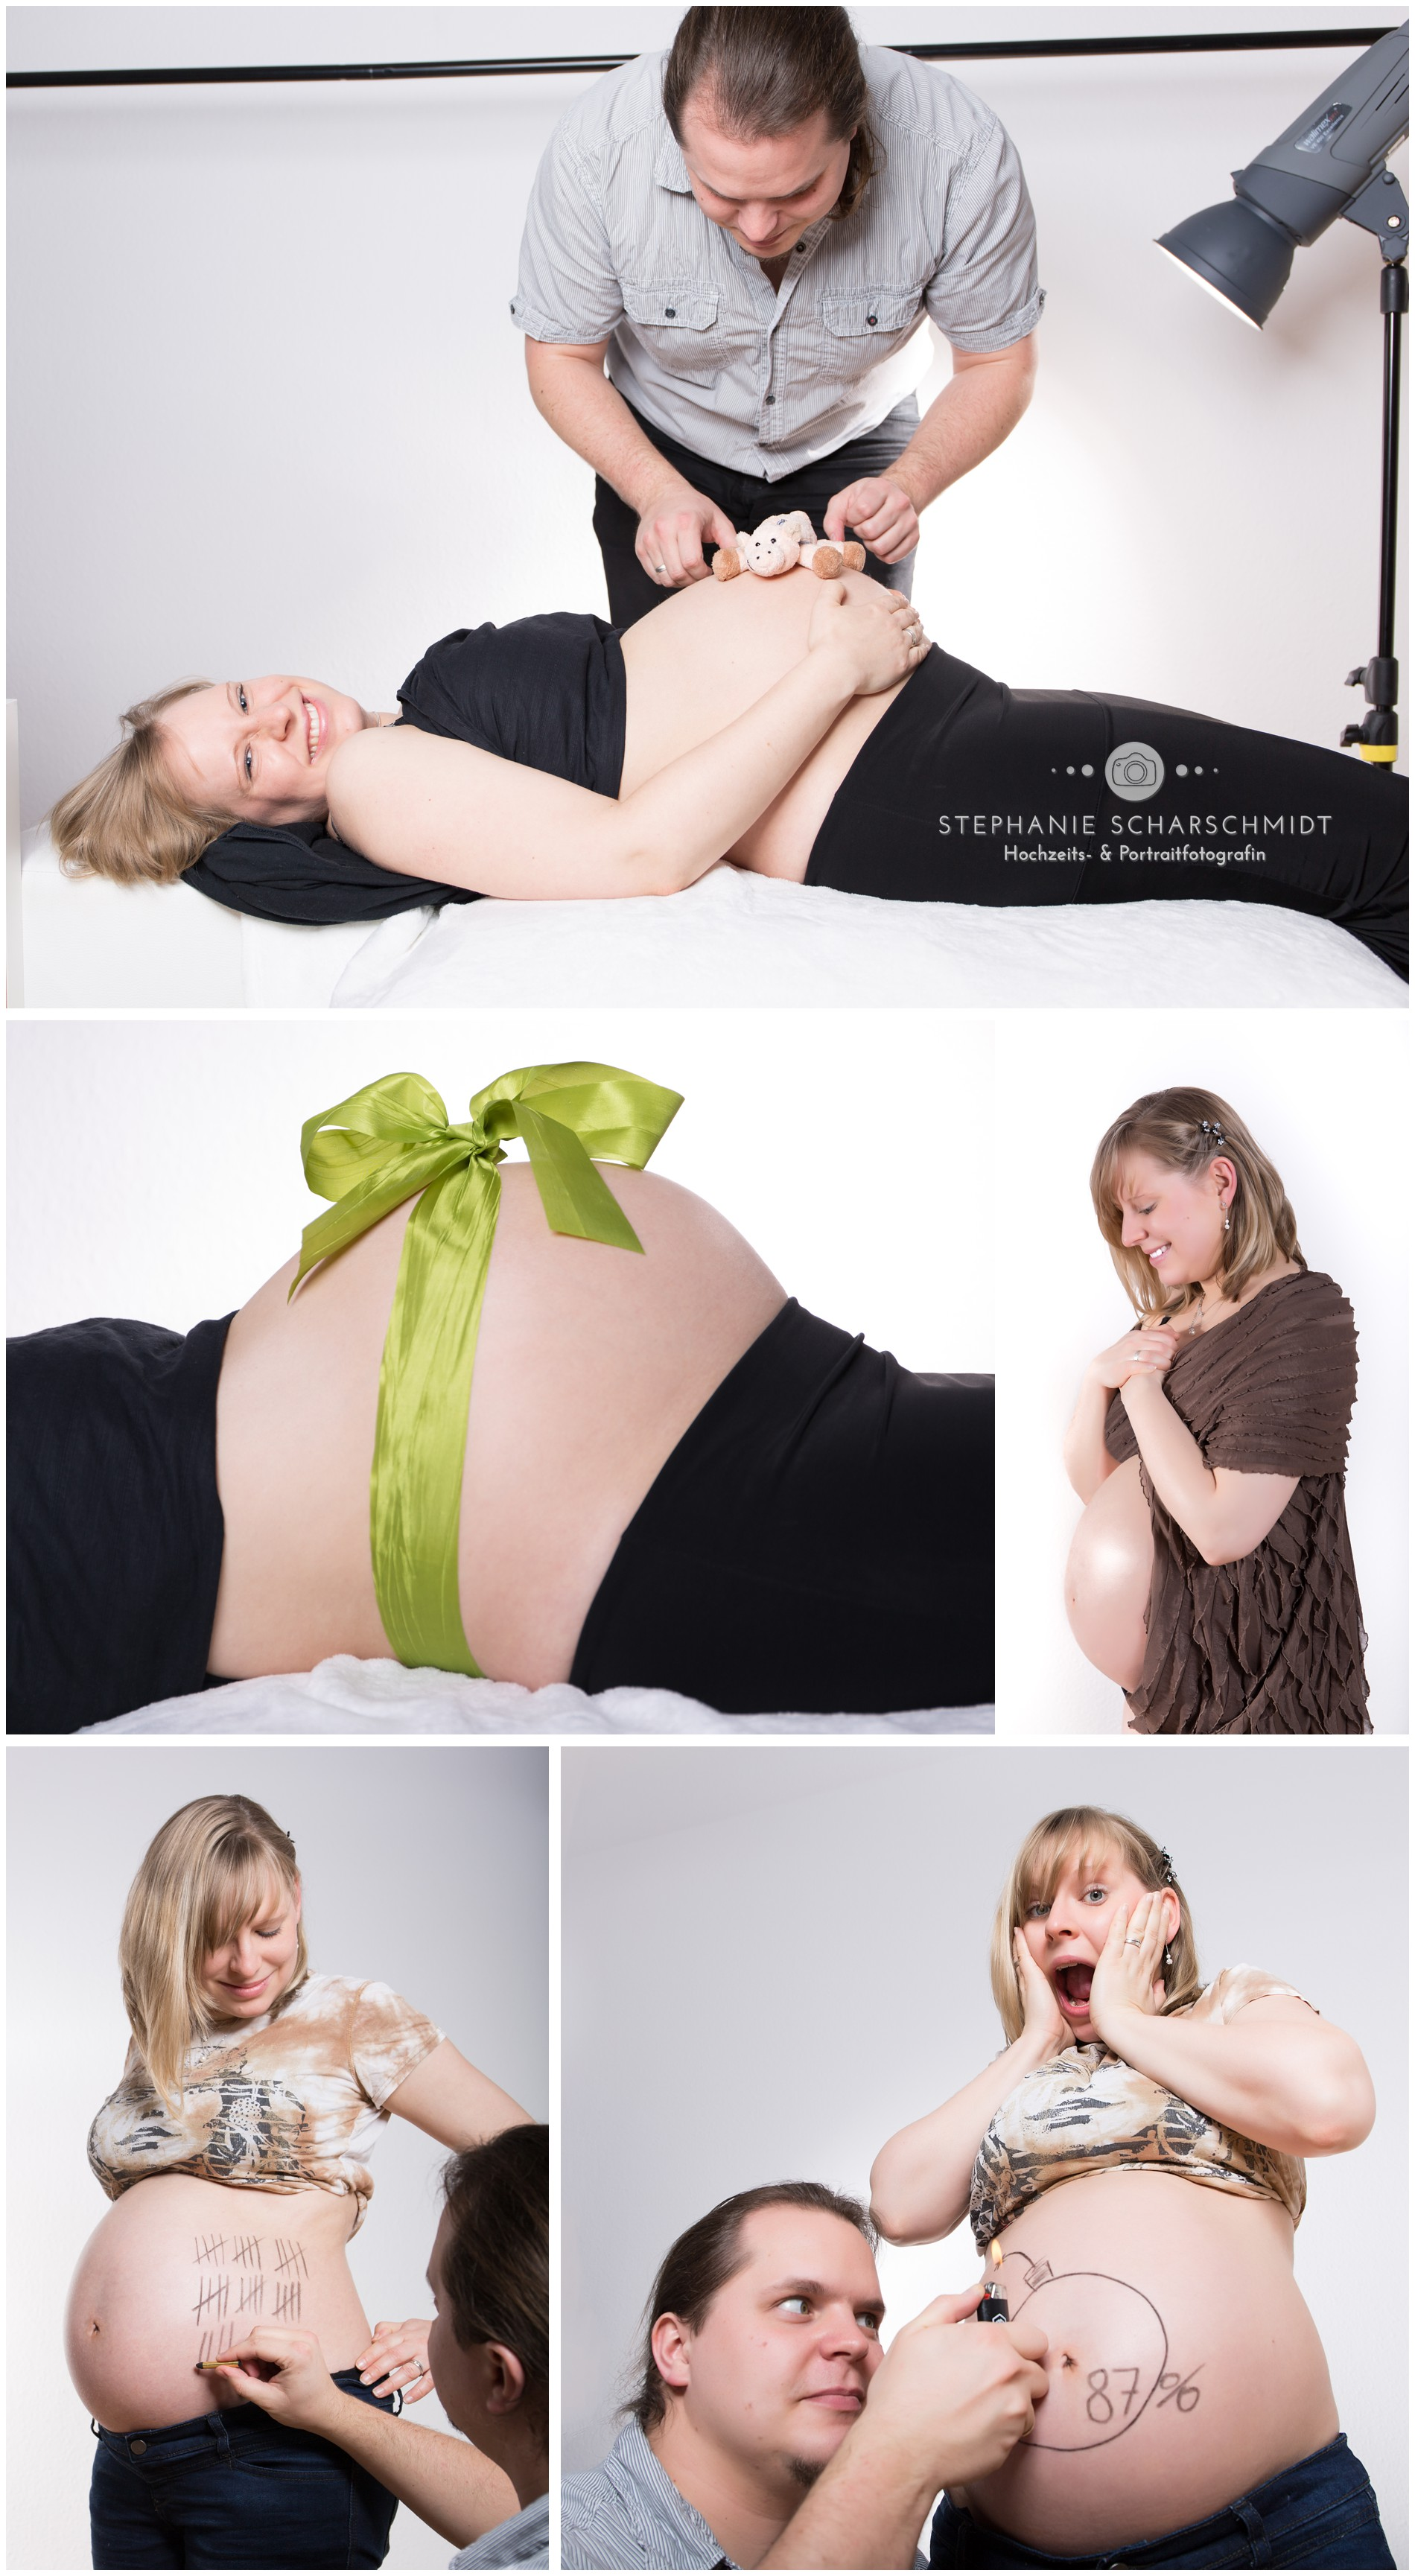 3 Schwangerschaftsfotos Plauen, Zeulenroda, Jena – Portraitfotografin Stephanie Scharschmidt